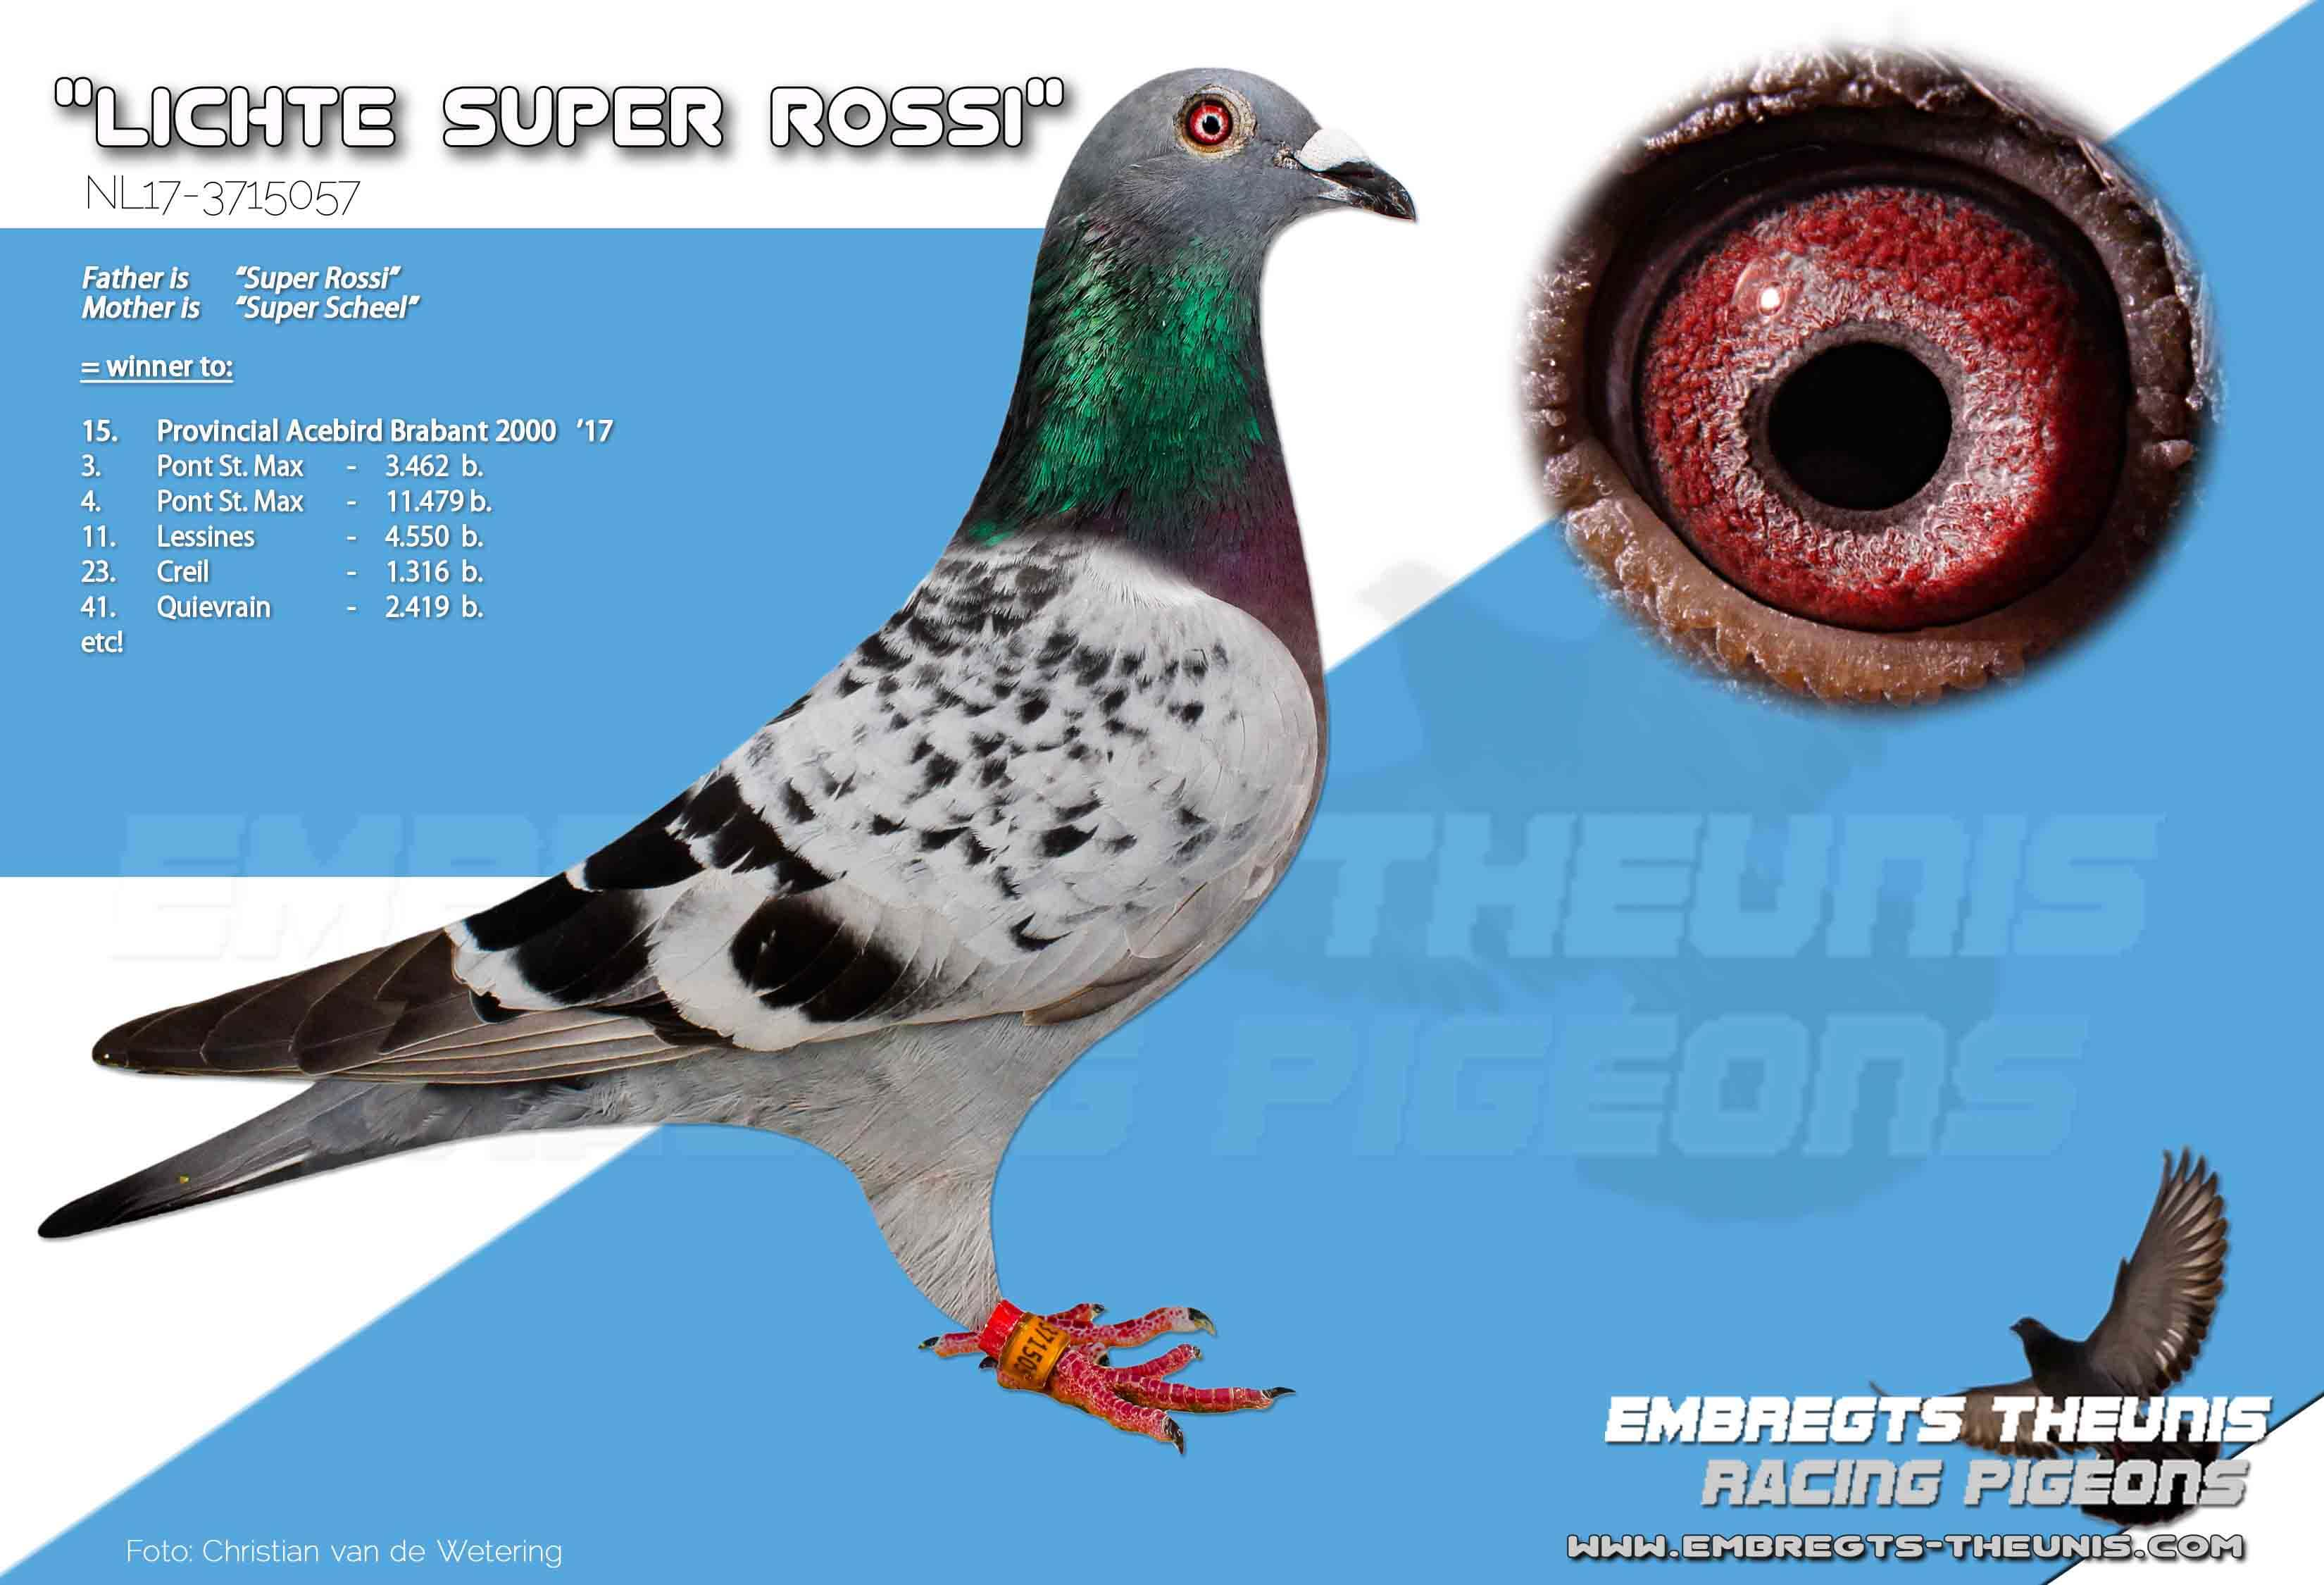 Lichte-Super-Rossi-NL17-3715057